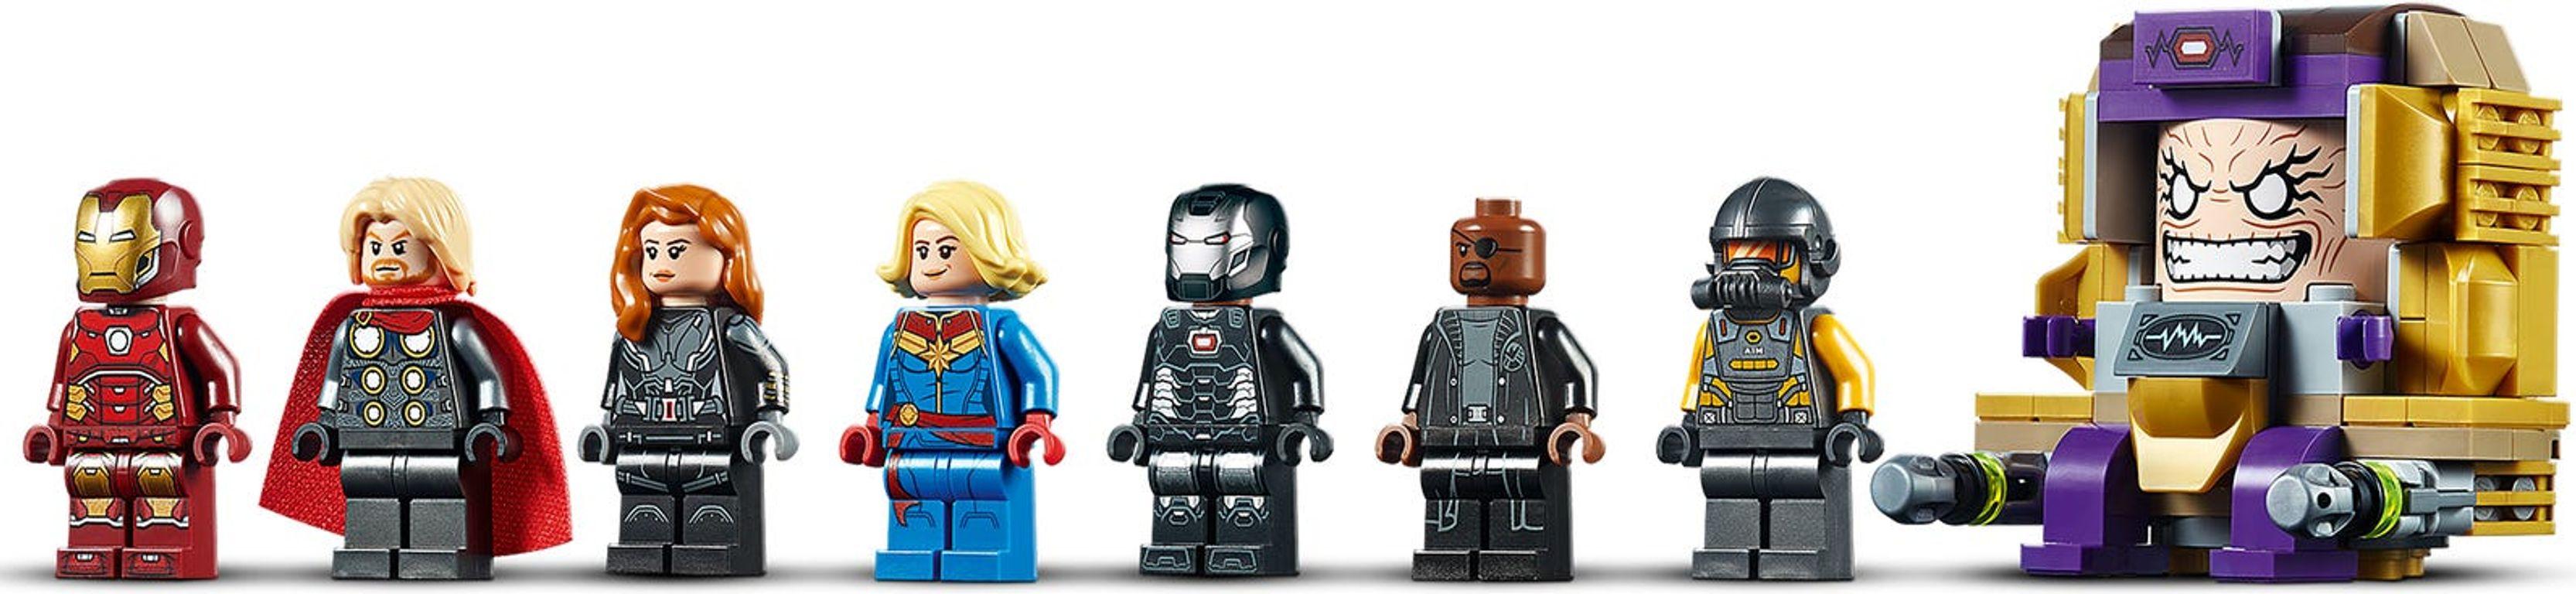 Avengers Helicarrier minifigures